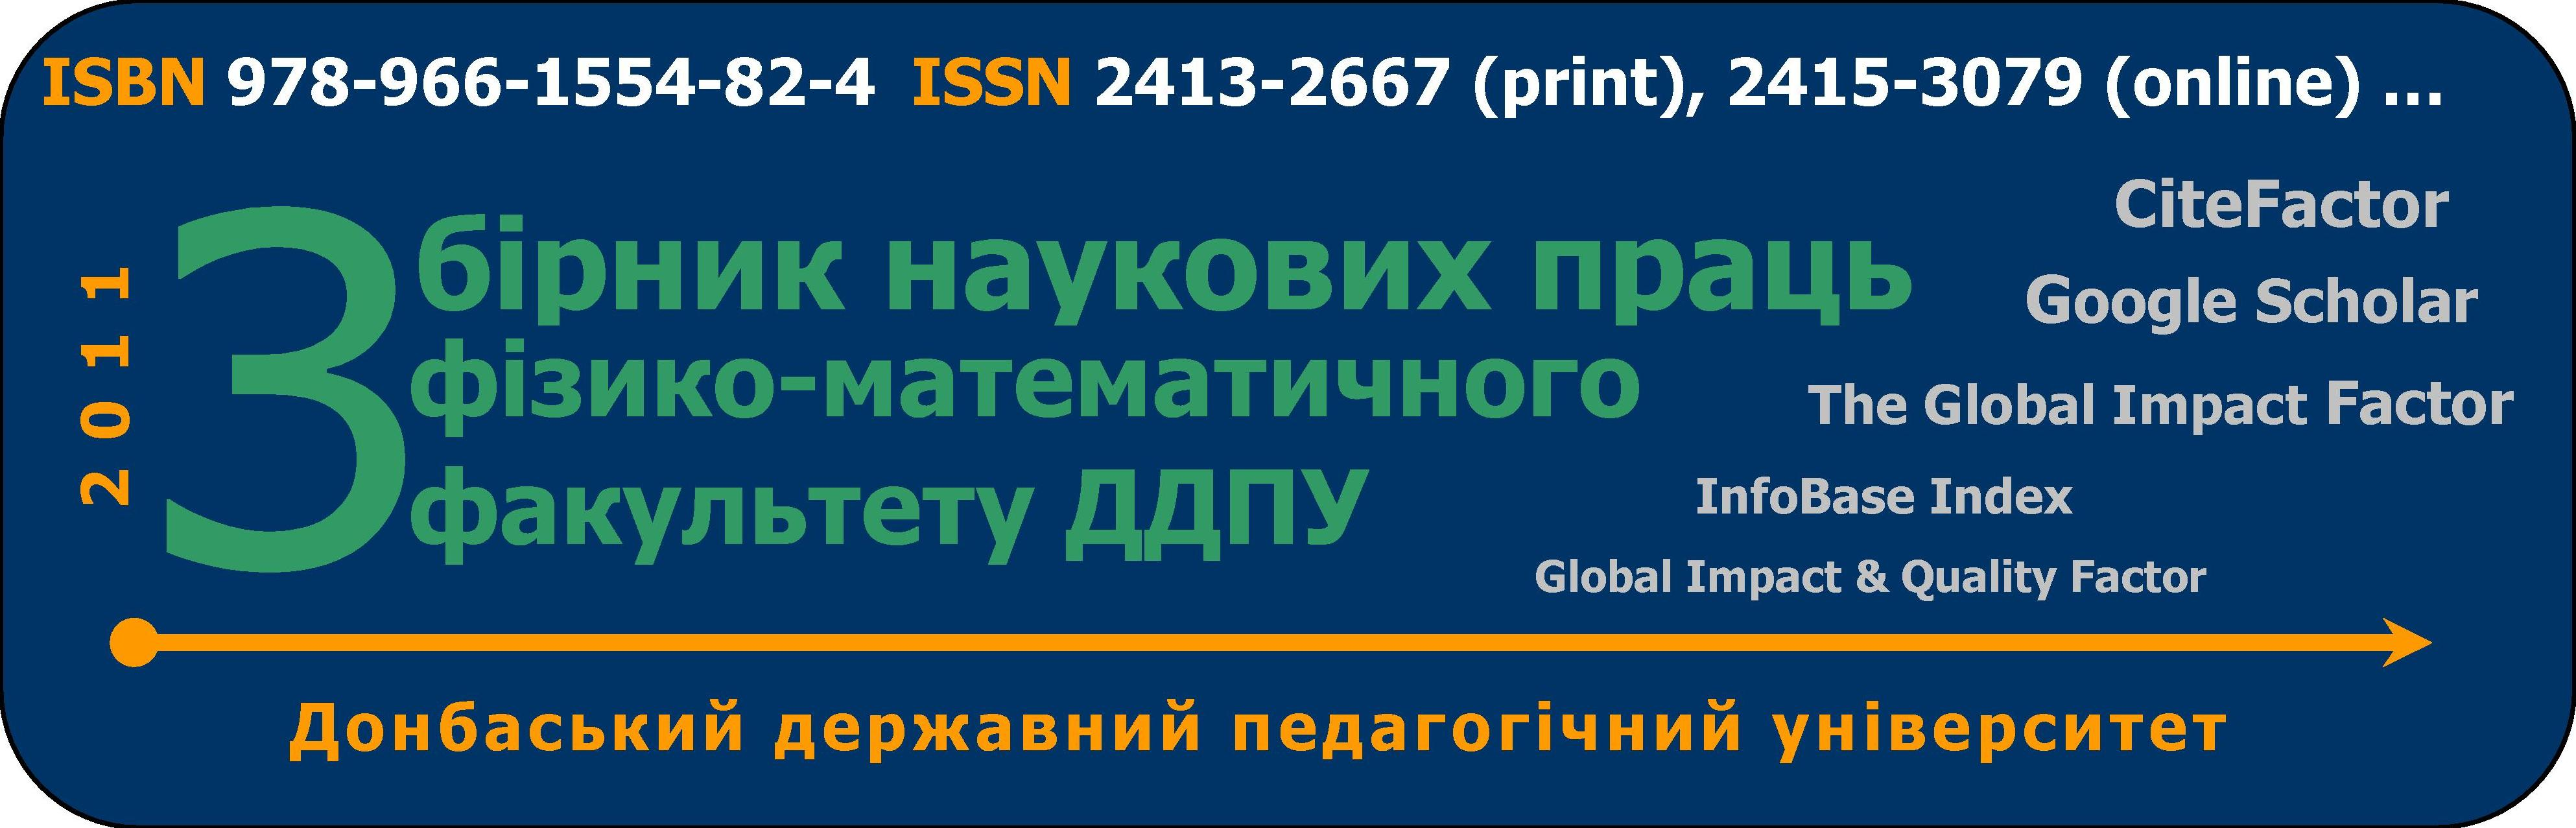 Zbirnik naukovih prac' fiziko-matematicnogo fakul'tetu DDPU